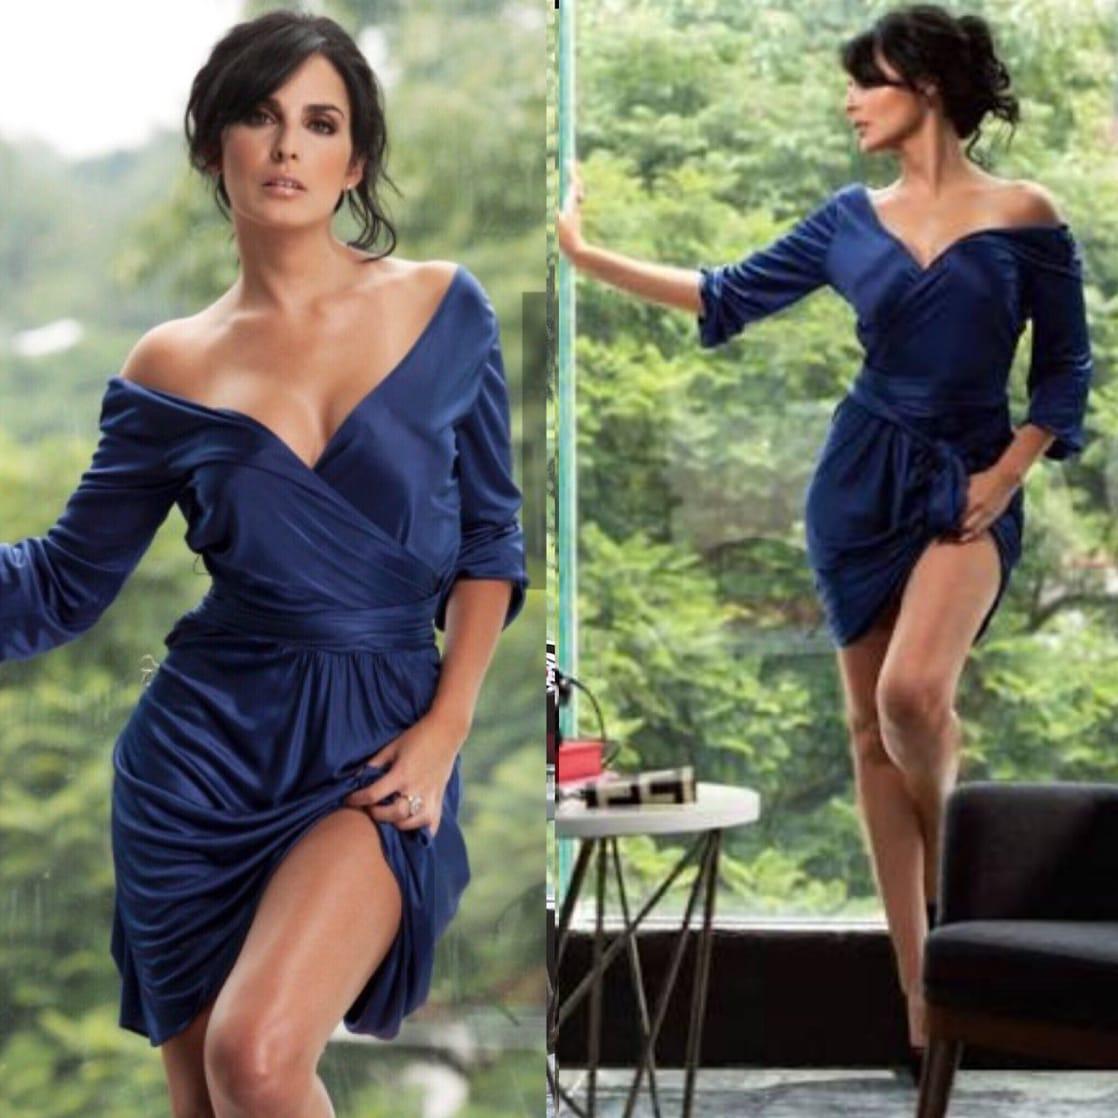 Ximena Herrera Nude Photos 1